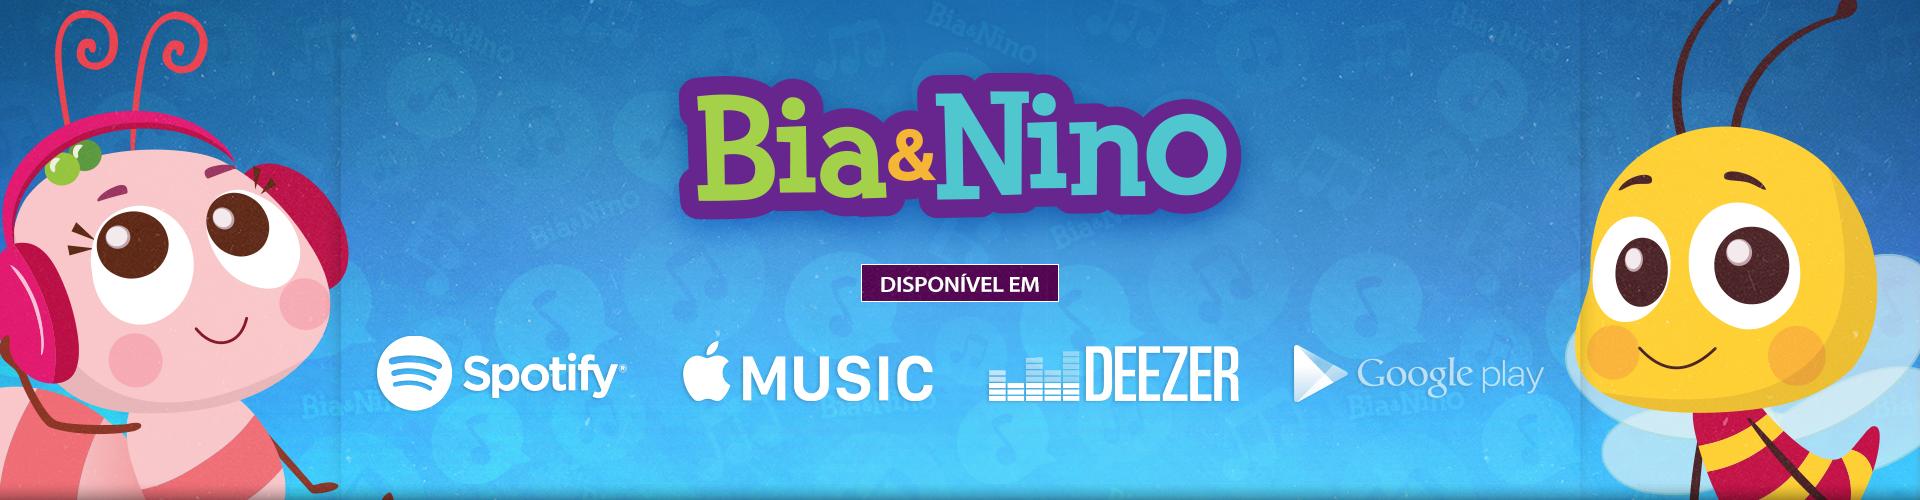 slider-site-bia&nino-disponivel-em